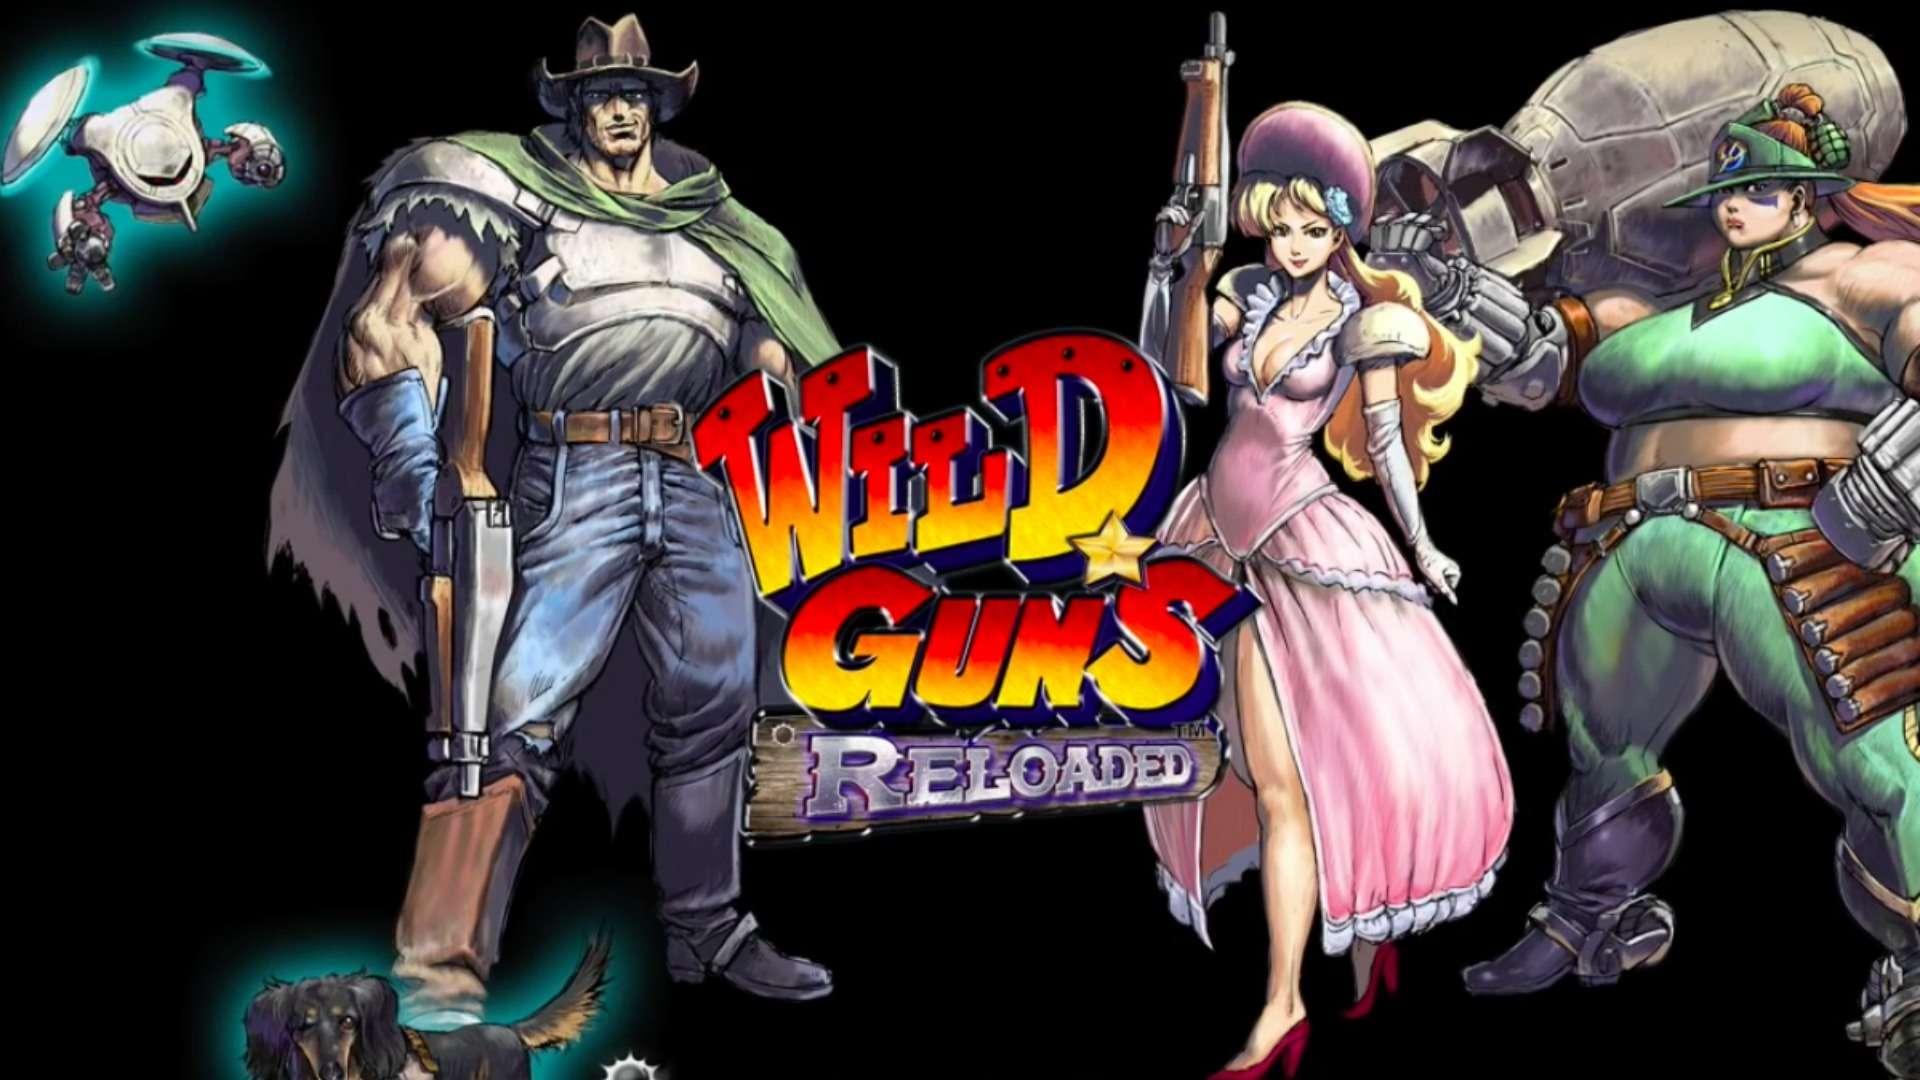 Wild guns reloaded PC download